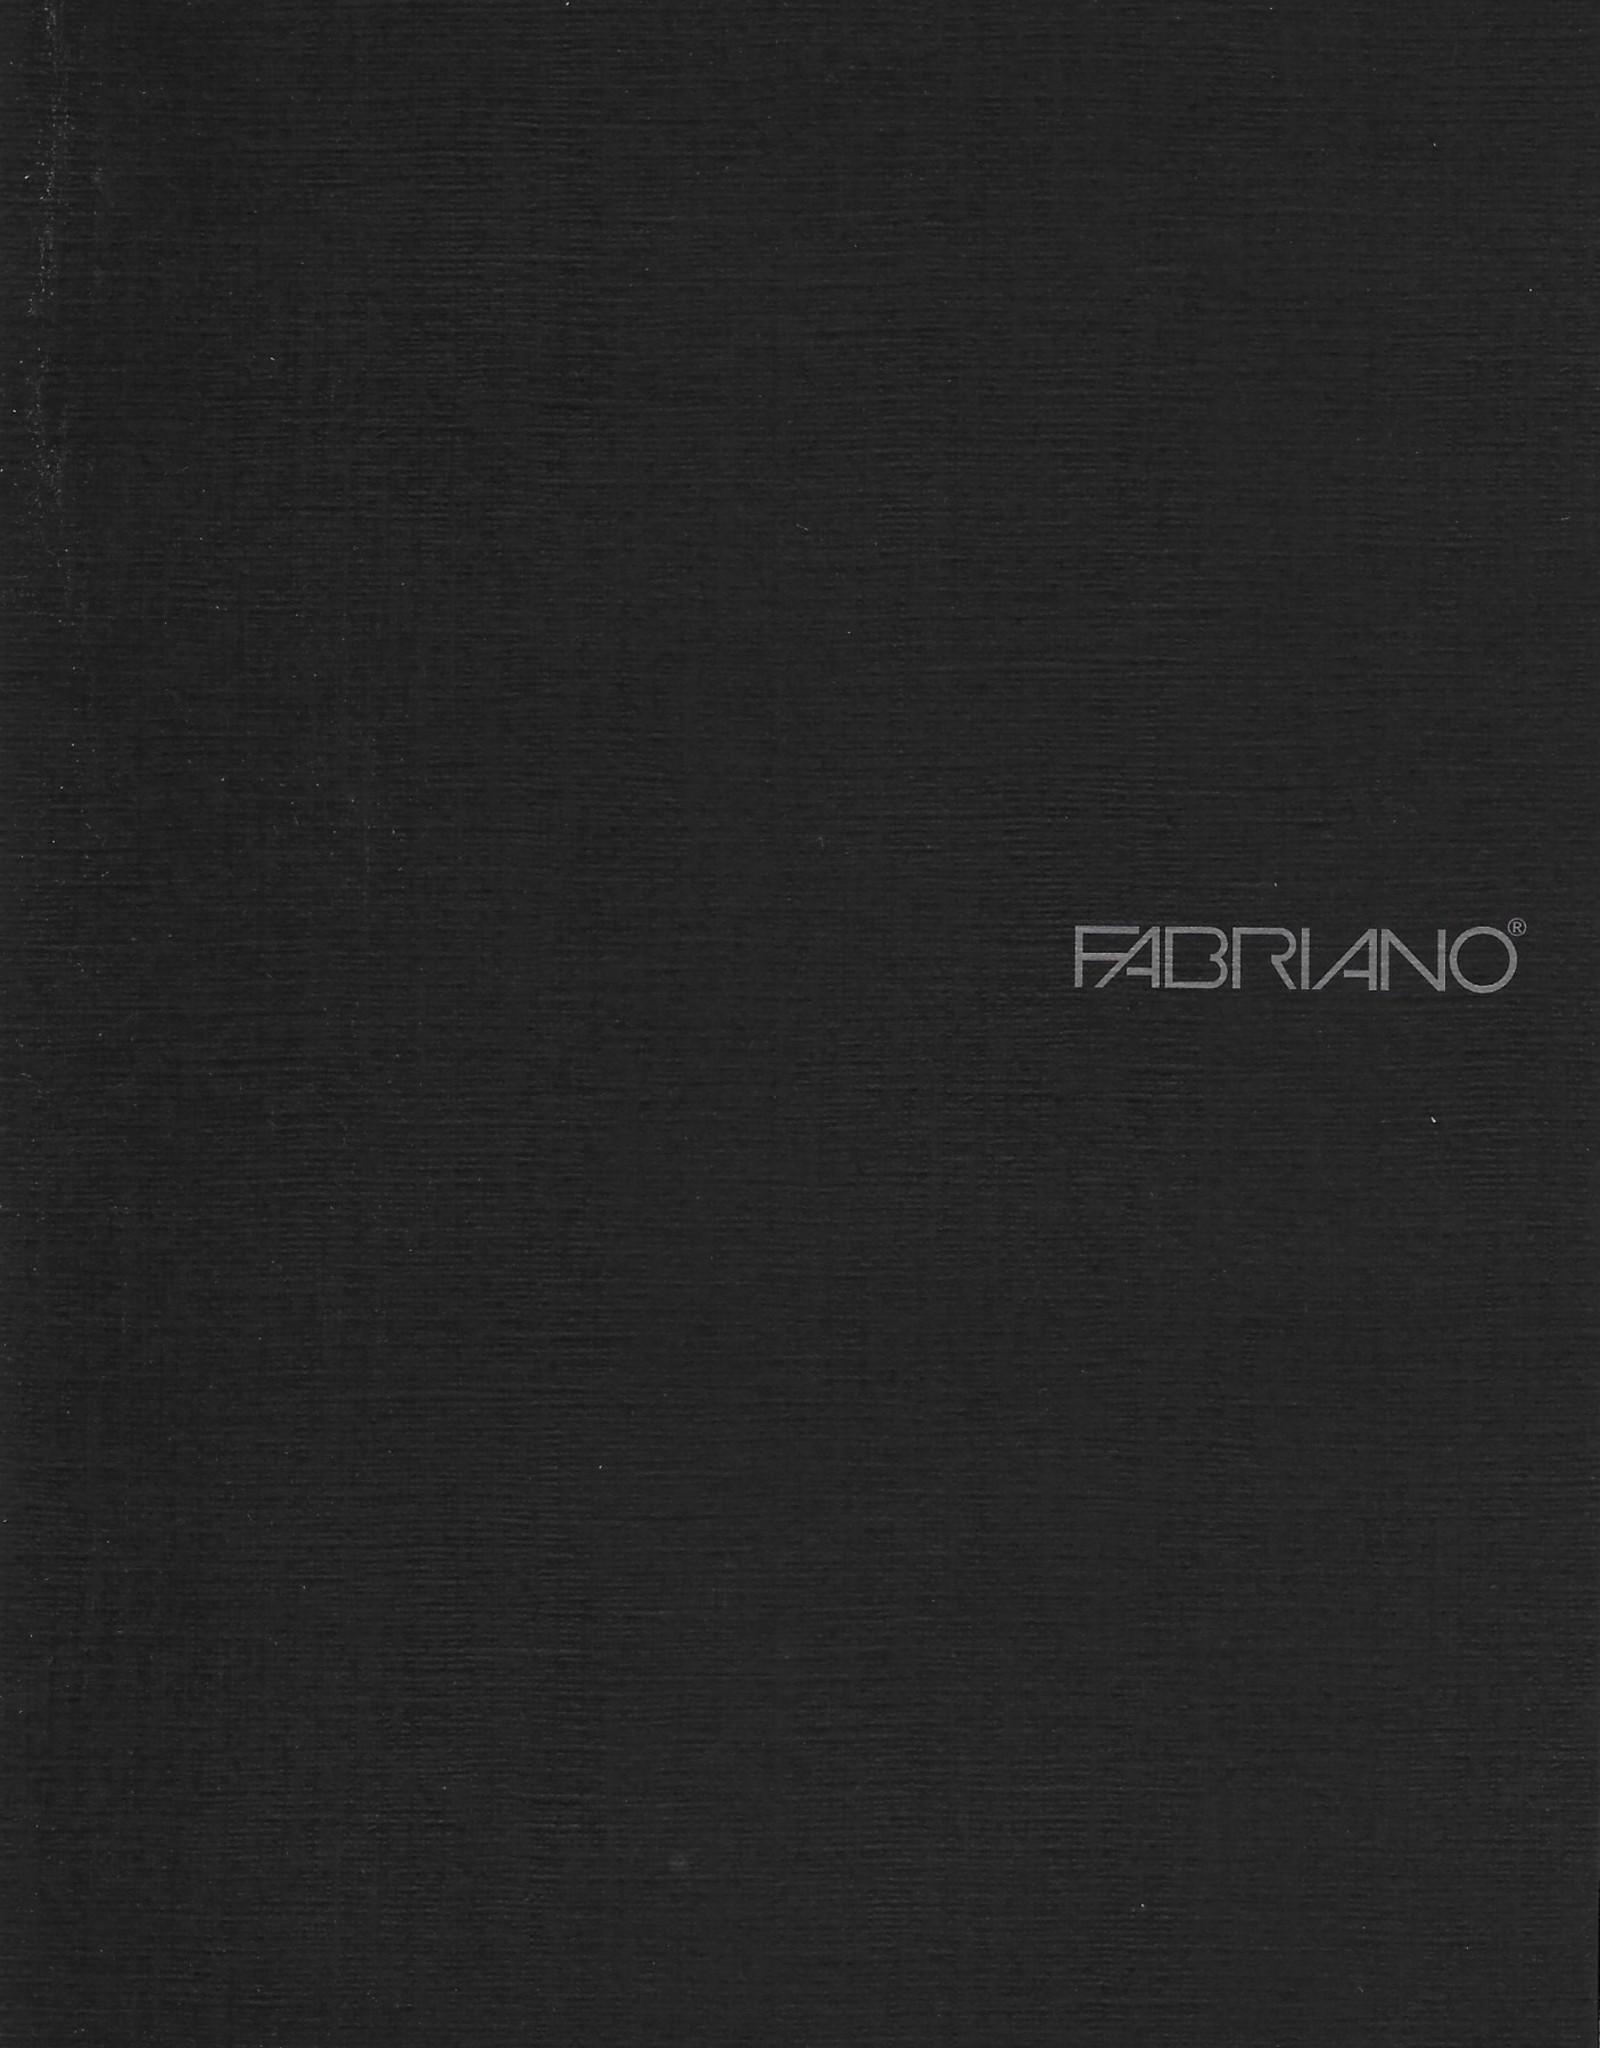 "Fabriano EcoQua Blank Notebook, Black, 5.75"" x 8.25"" 40 Sheets"